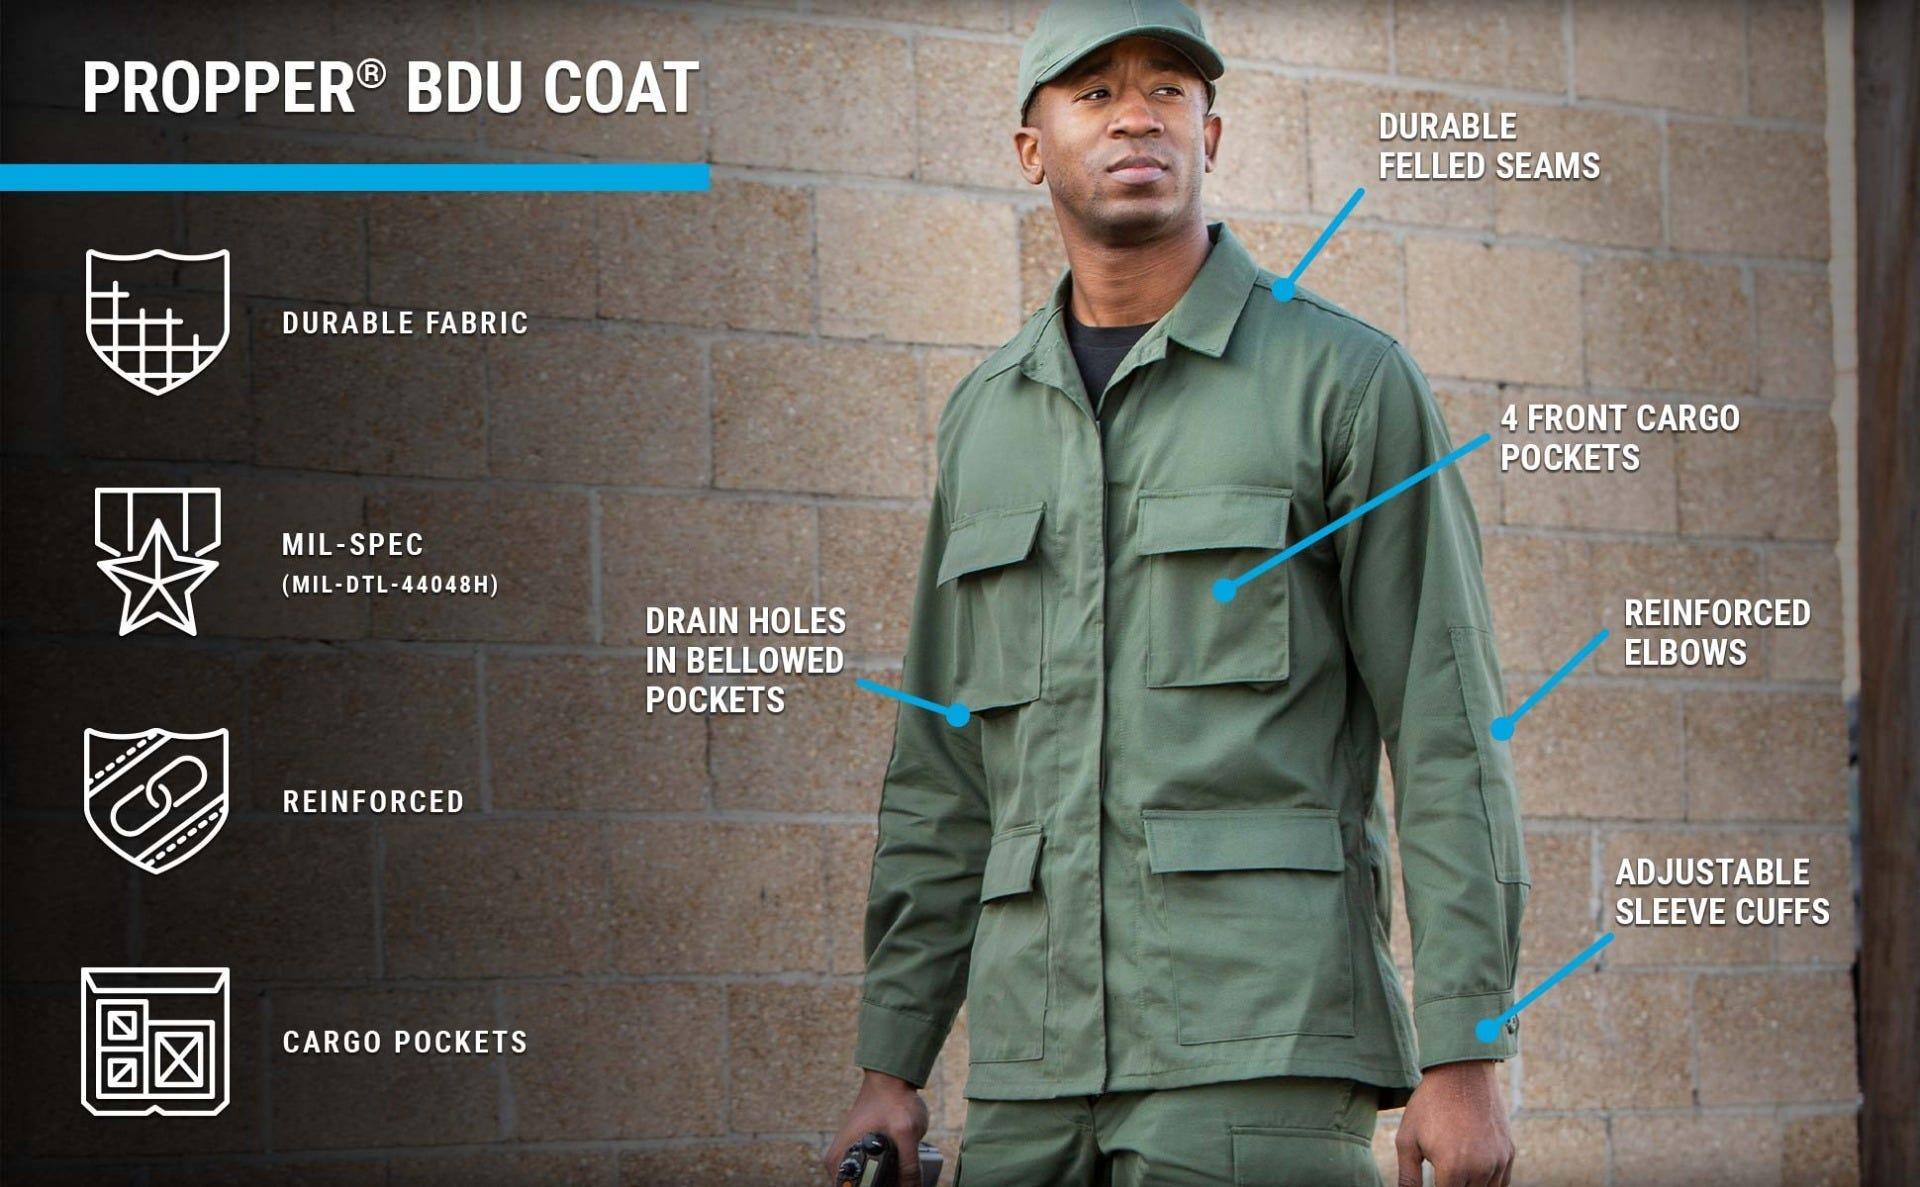 Man wearing olive BDU Coat with 4 cargo pockets and BDU patrol cap walking